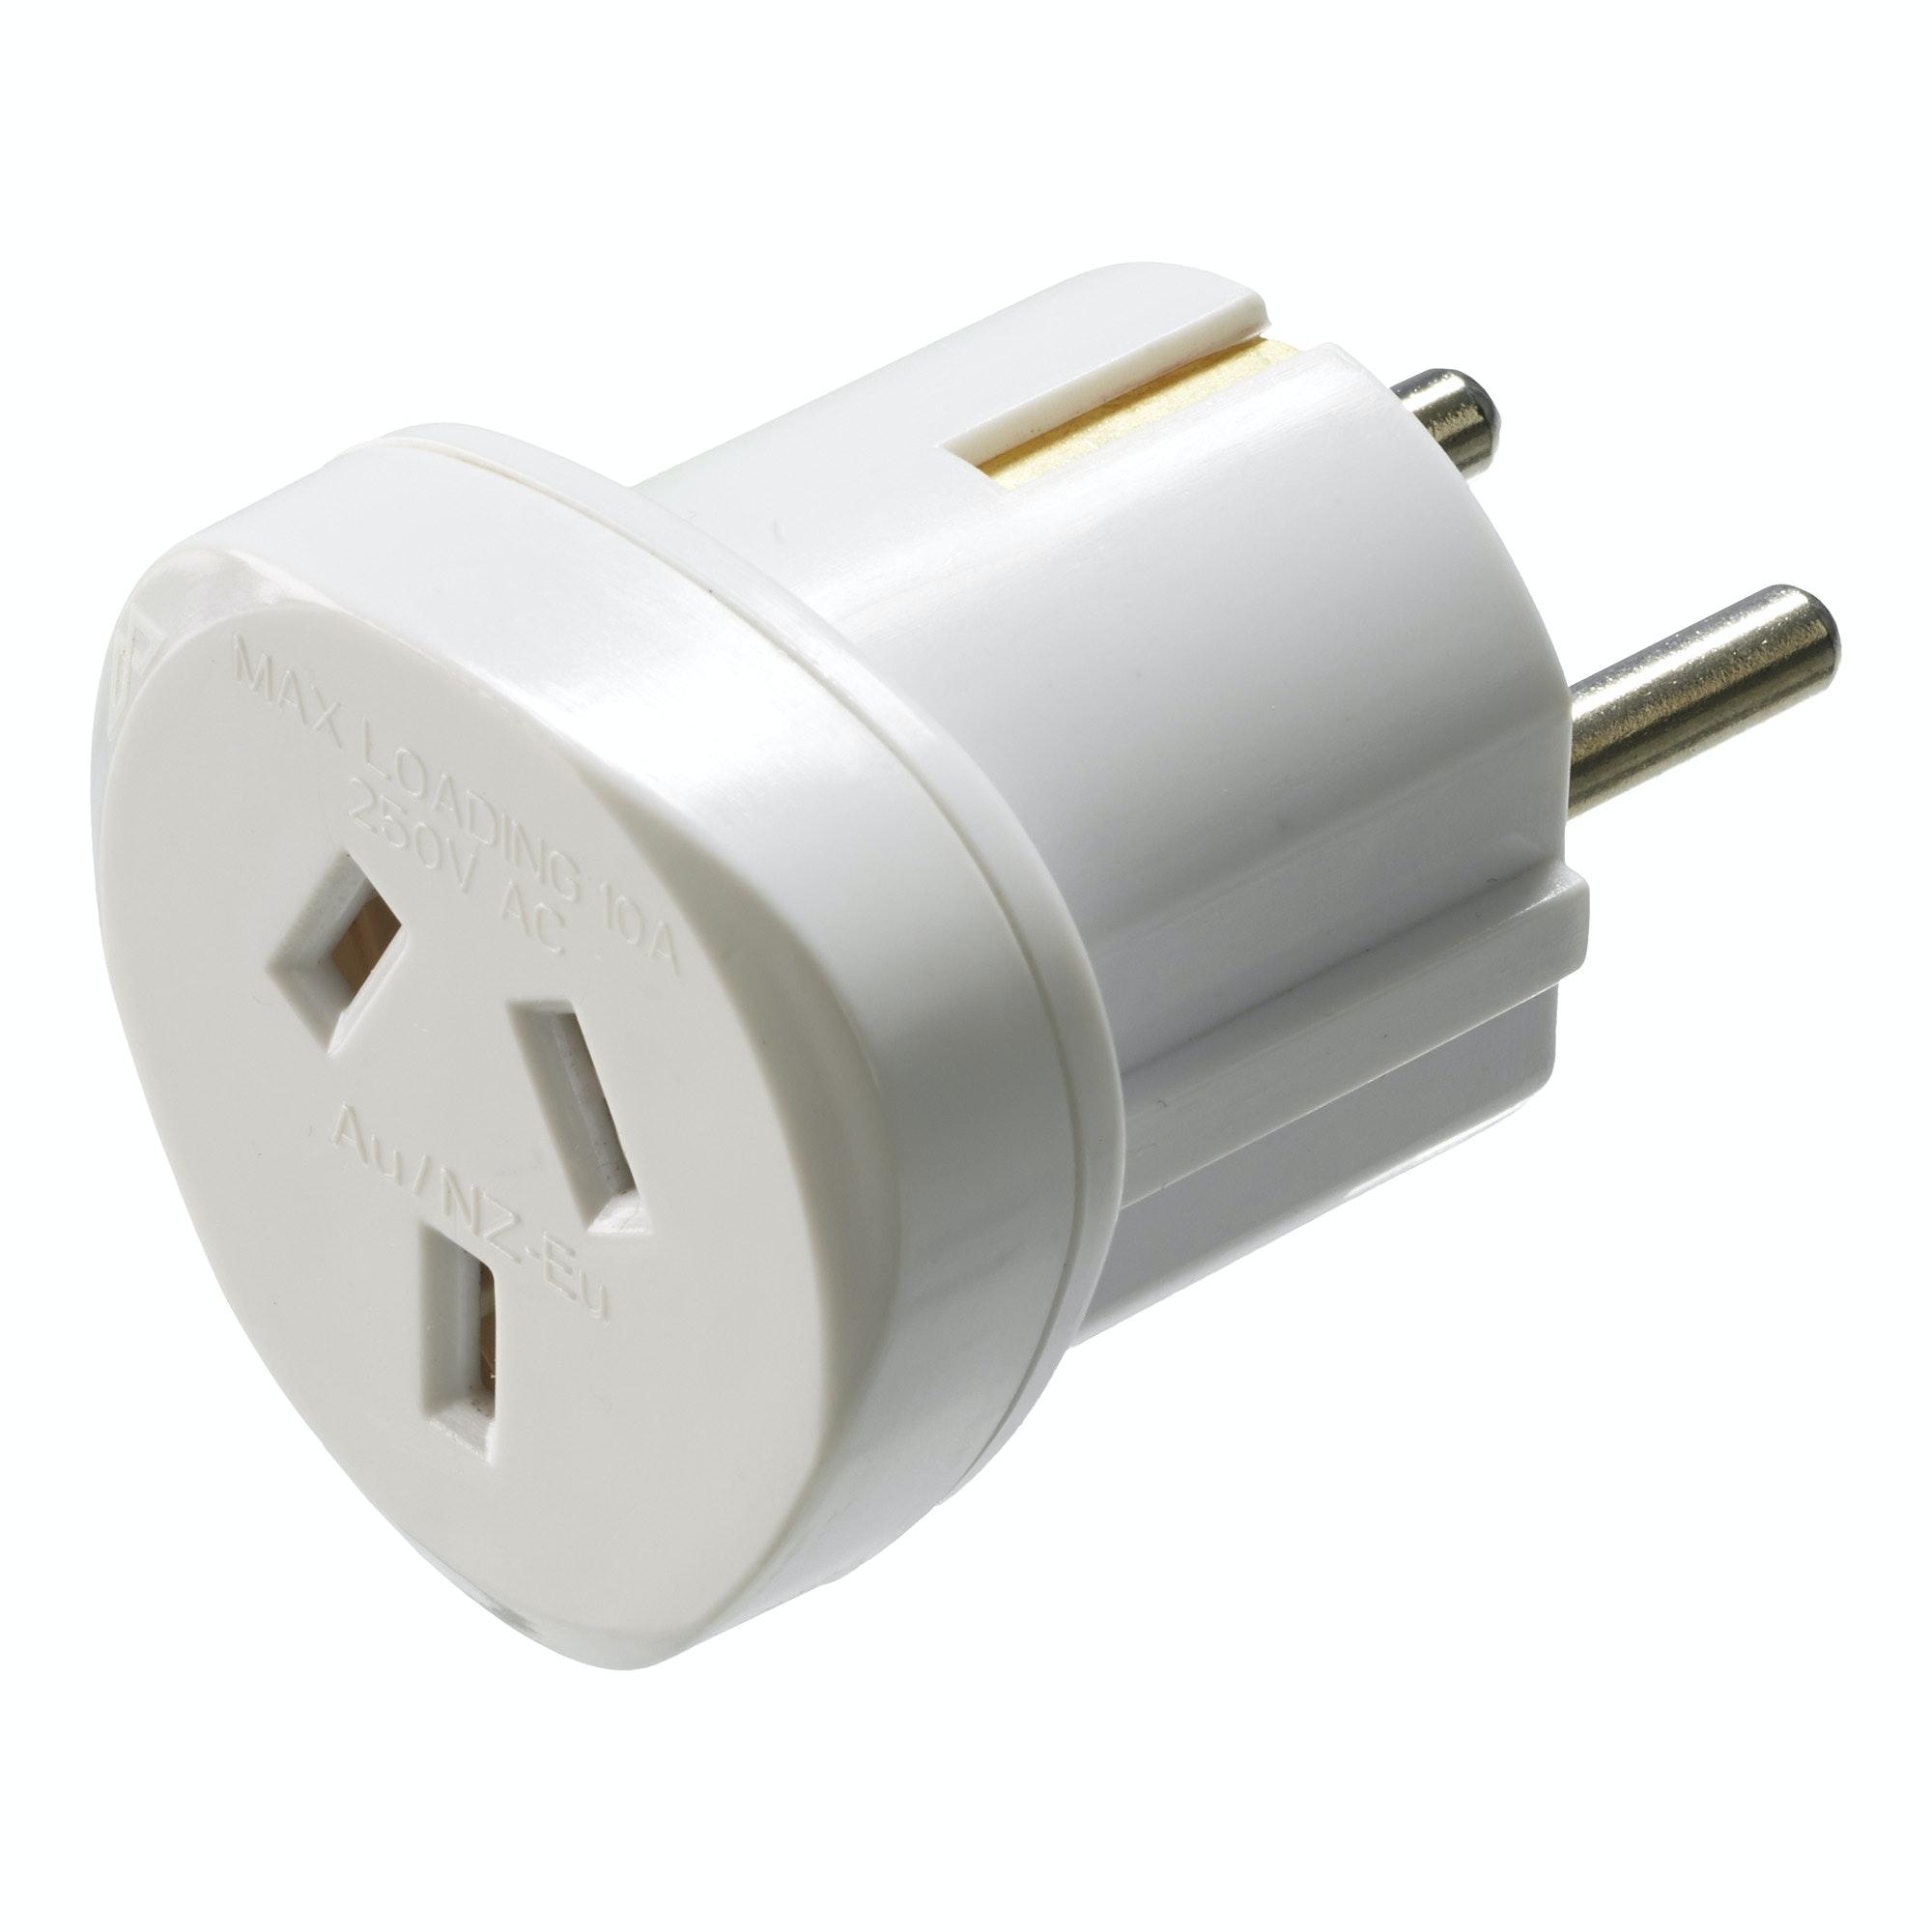 Adaptor Plug Europe V2